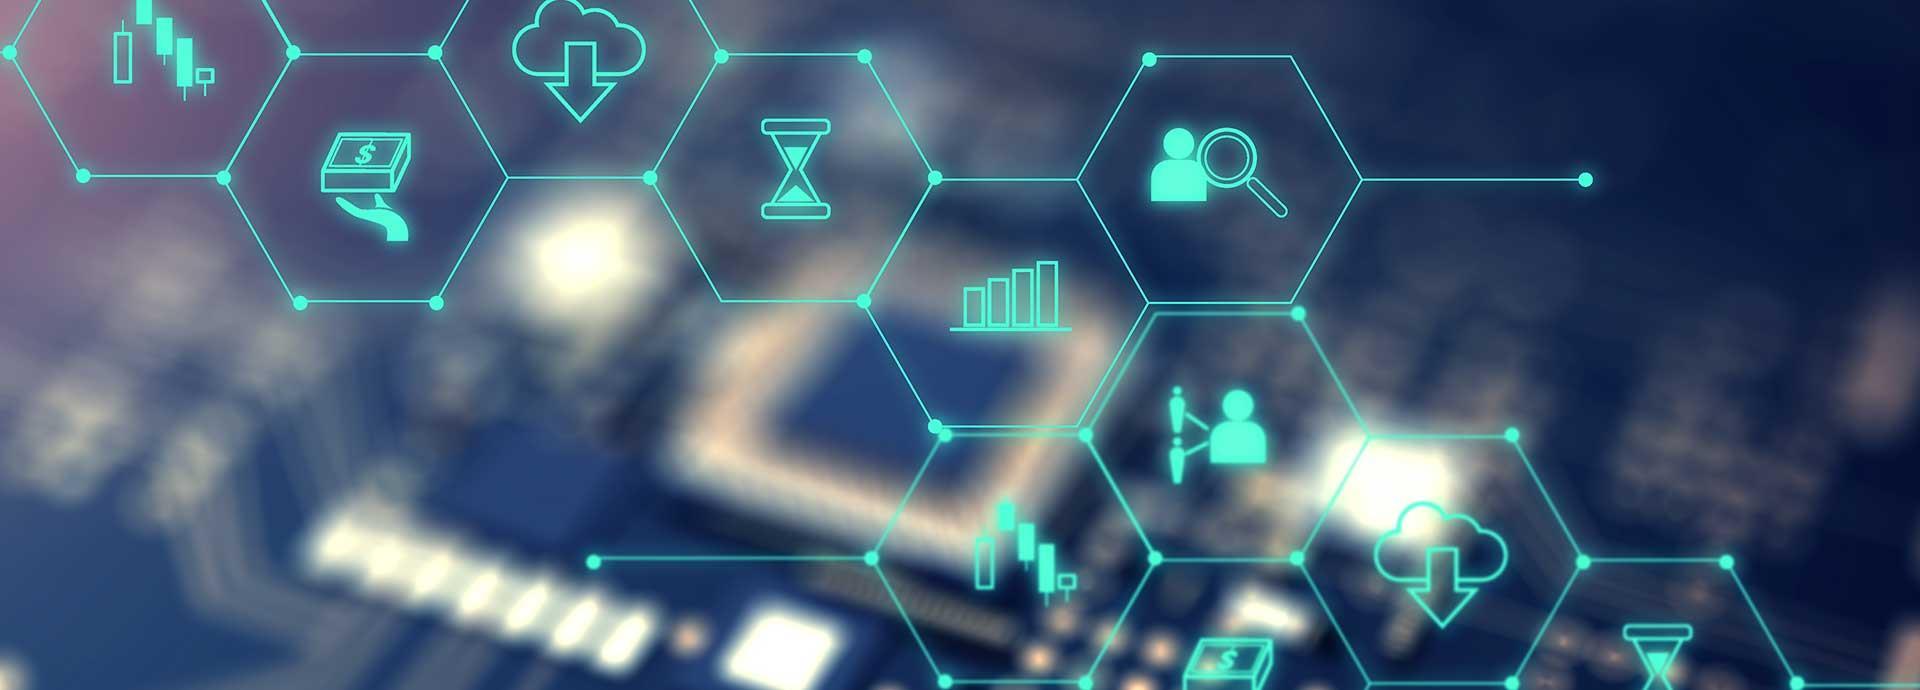 Blockchain technology - Hype vs reality